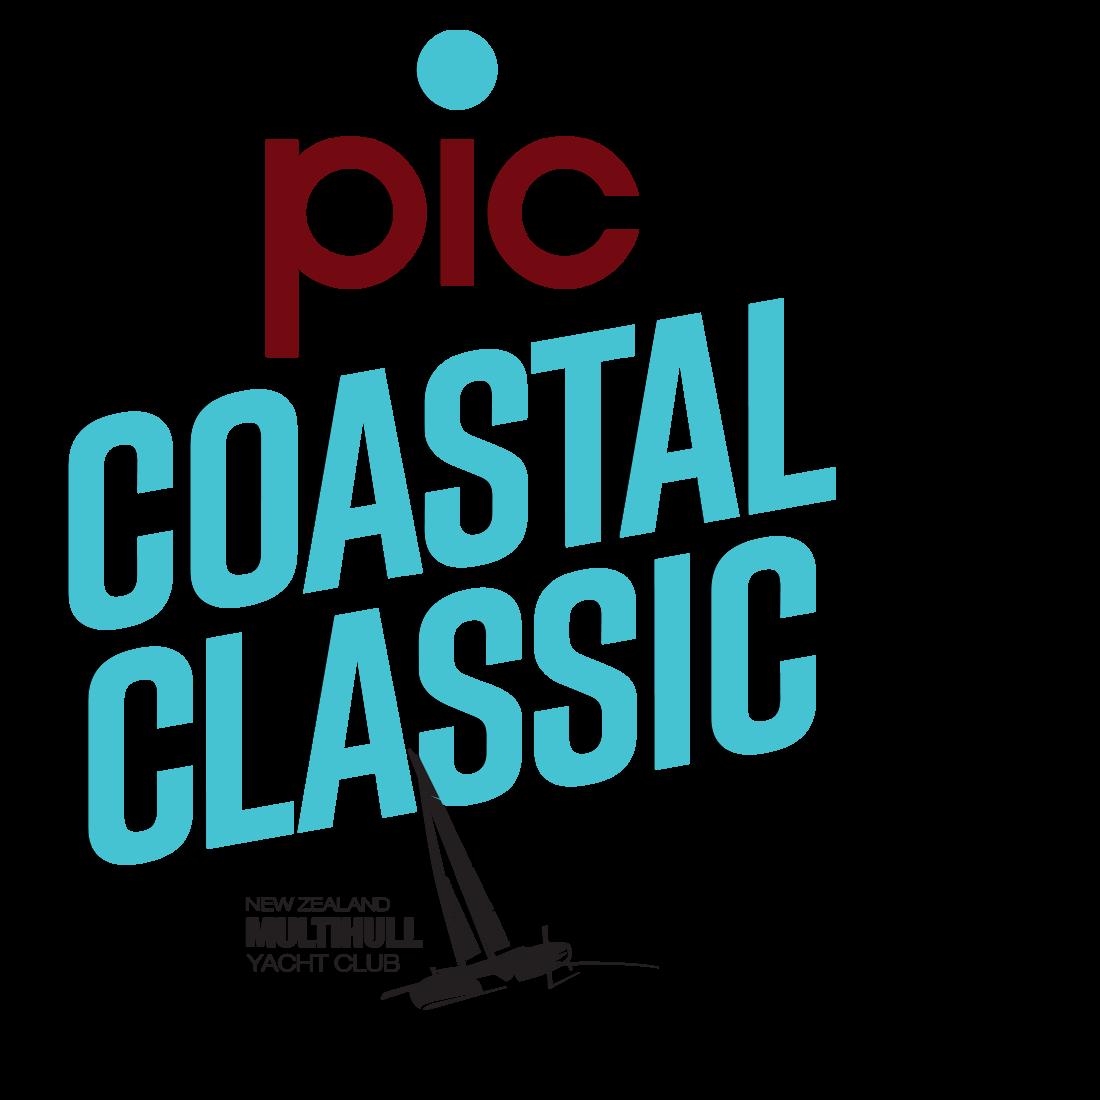 PIC CC NoYear_NZMYC Logo Stacked Web